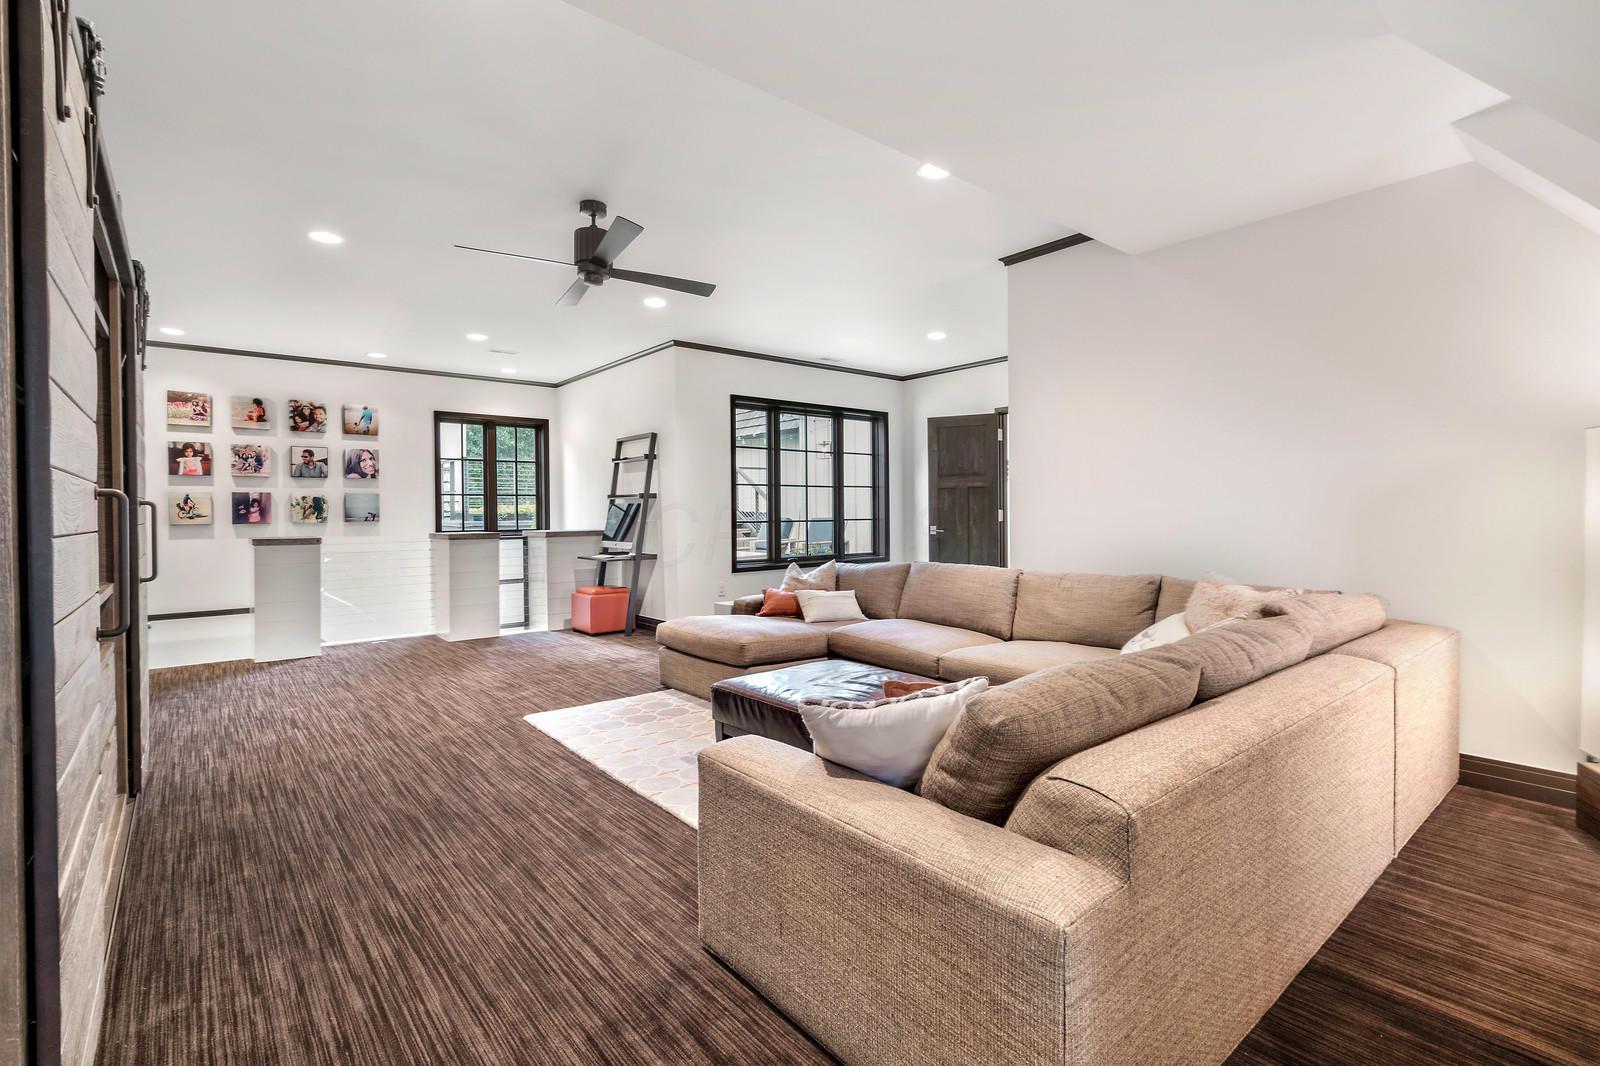 6931 Cosimo Lane, Pickerington, Ohio 43147, 5 Bedrooms Bedrooms, ,8 BathroomsBathrooms,Residential,For Sale,Cosimo,220016400